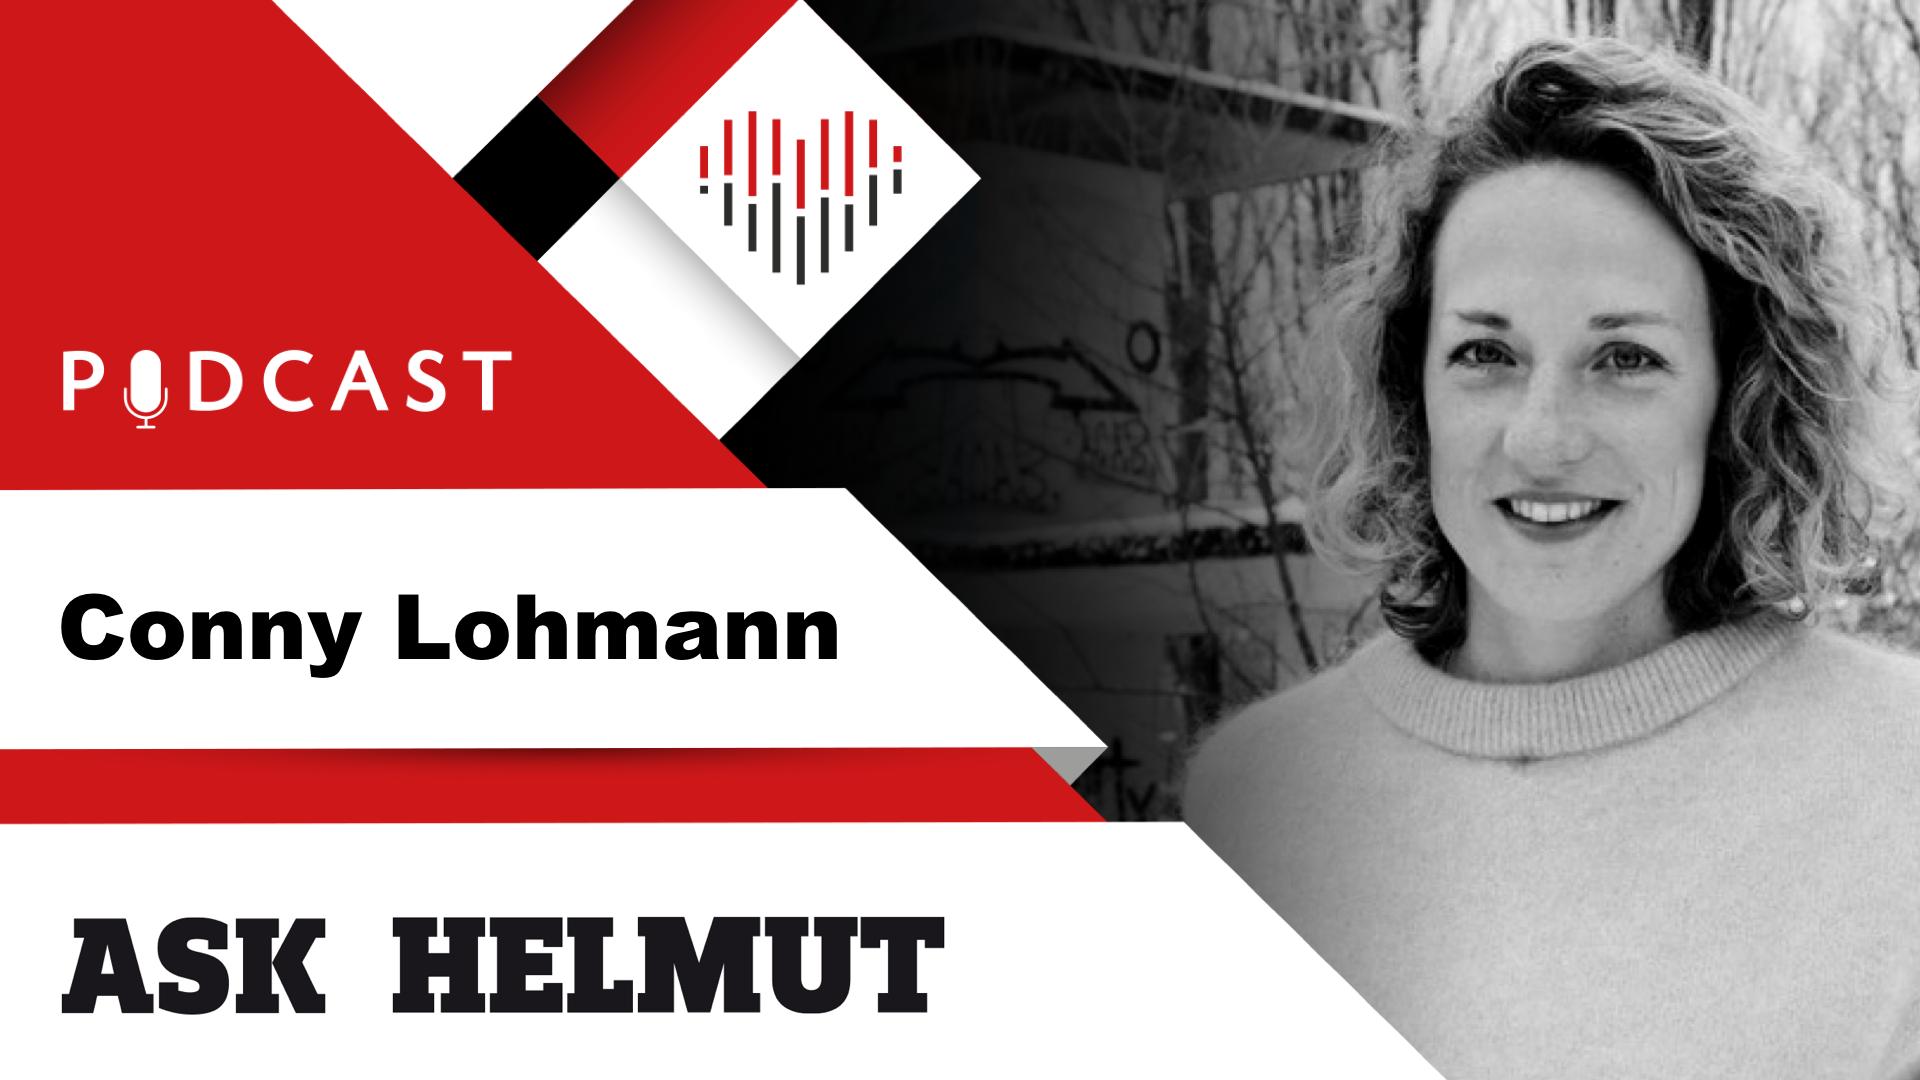 Digital Beat Podcast - Ask Helmut - Conny Lohmann